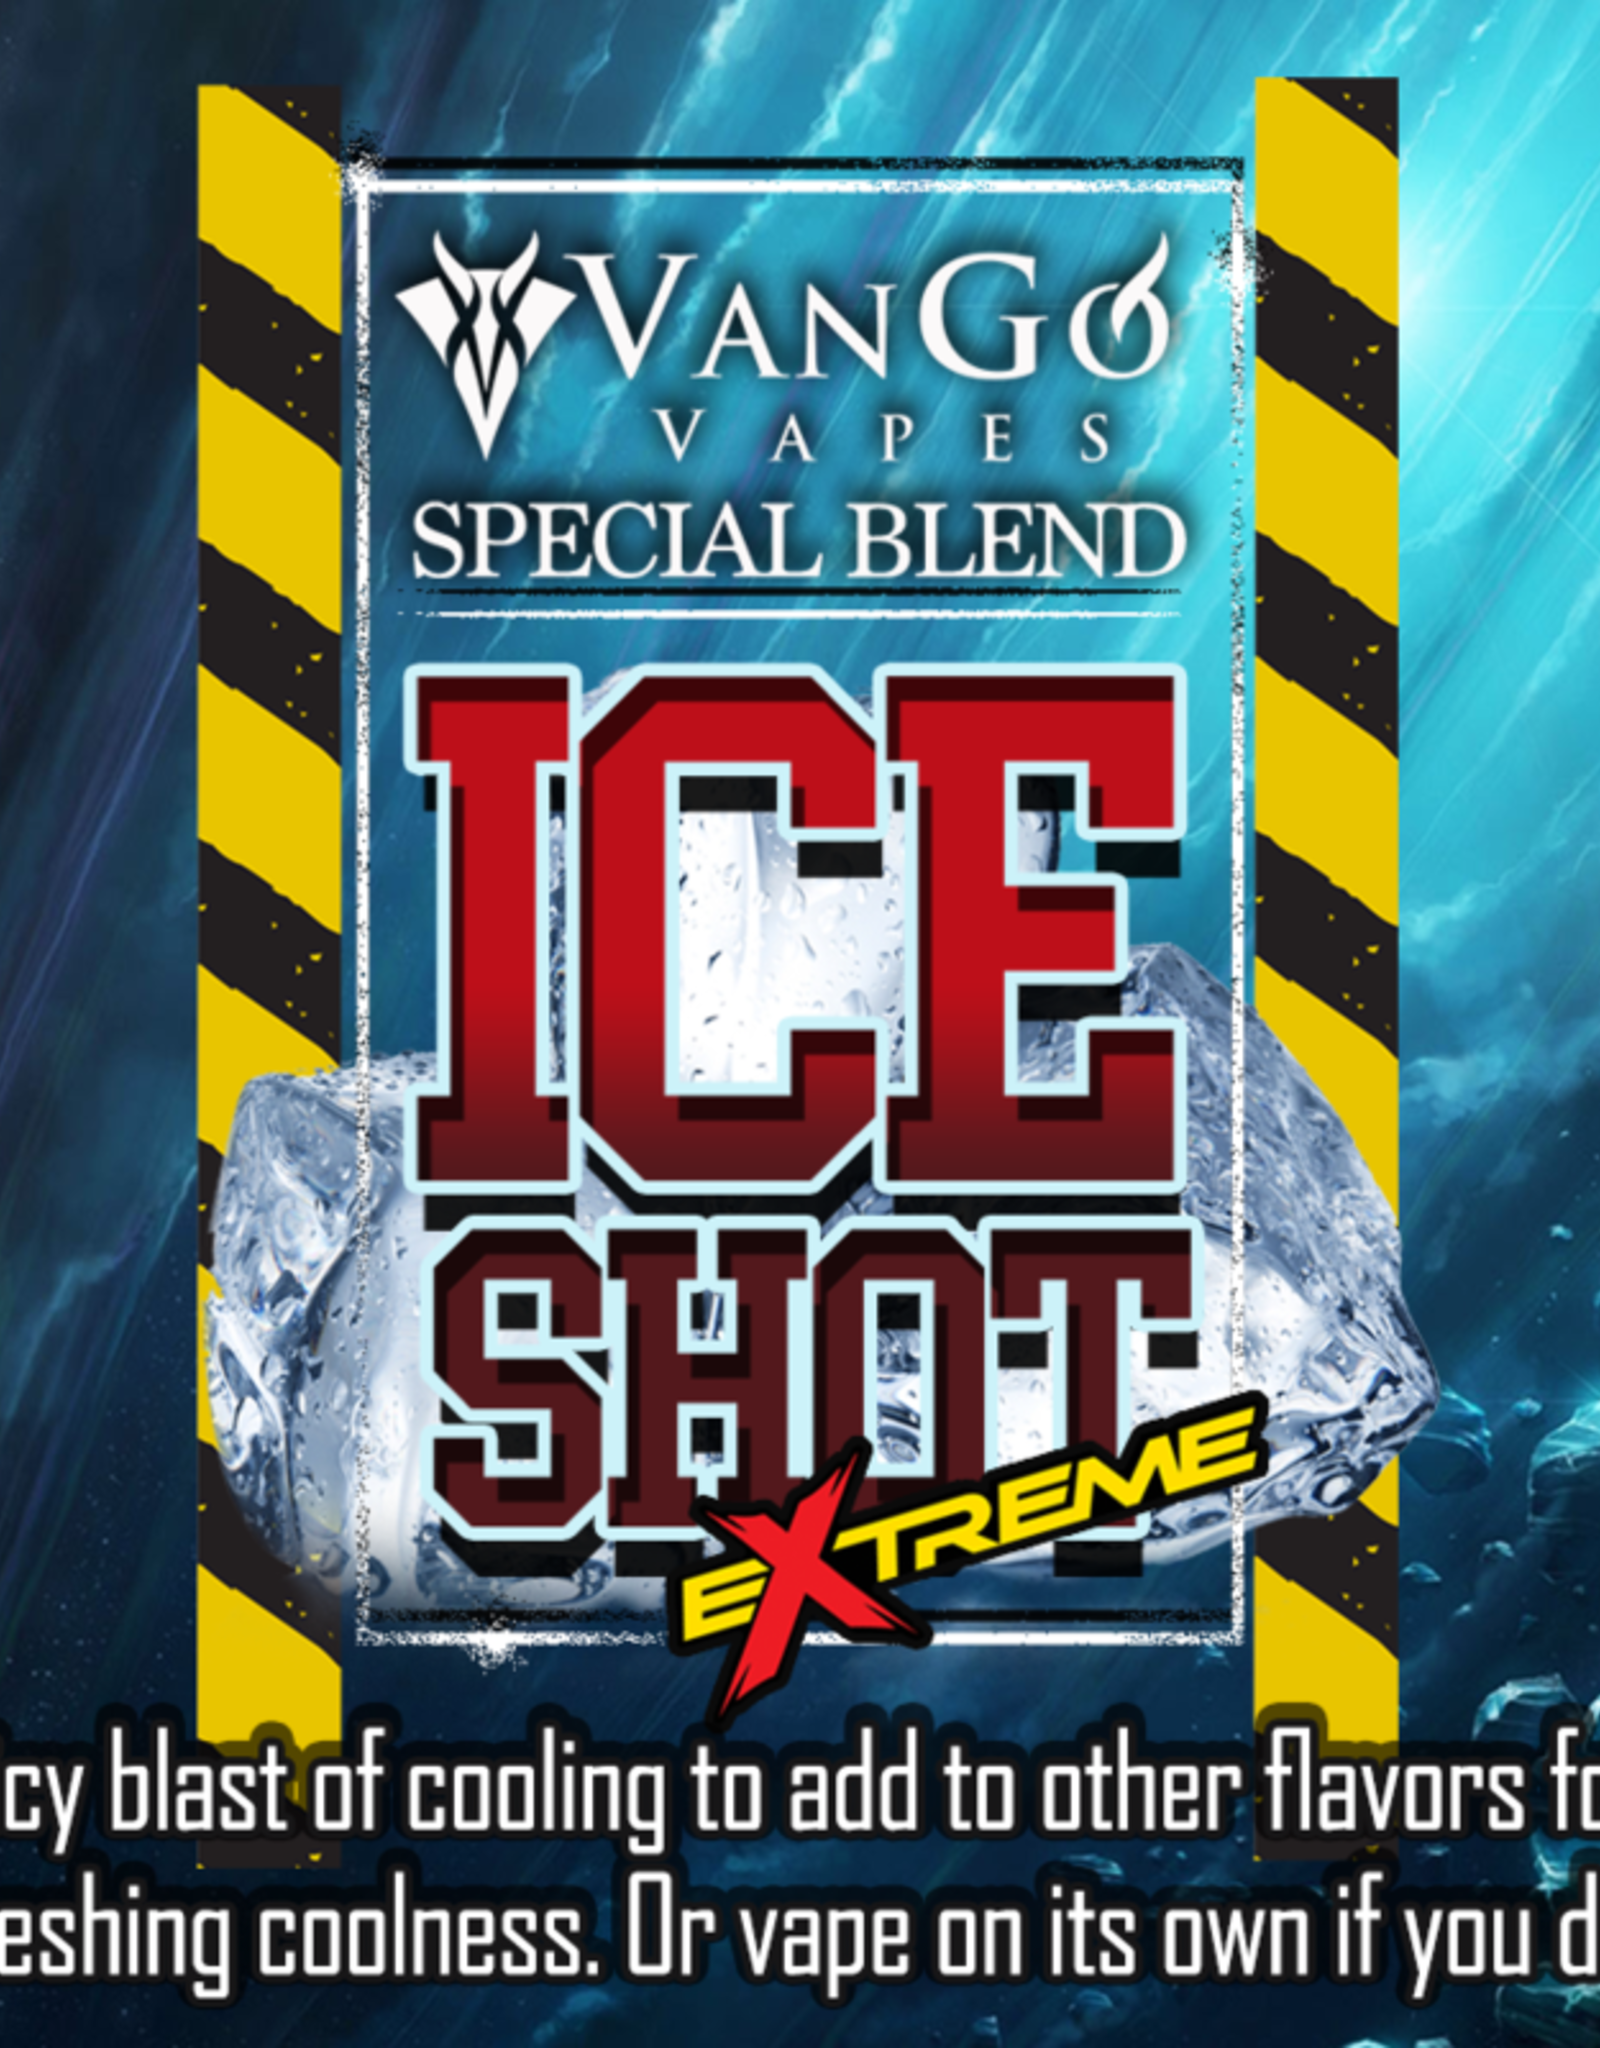 VANGO ICE SHOT